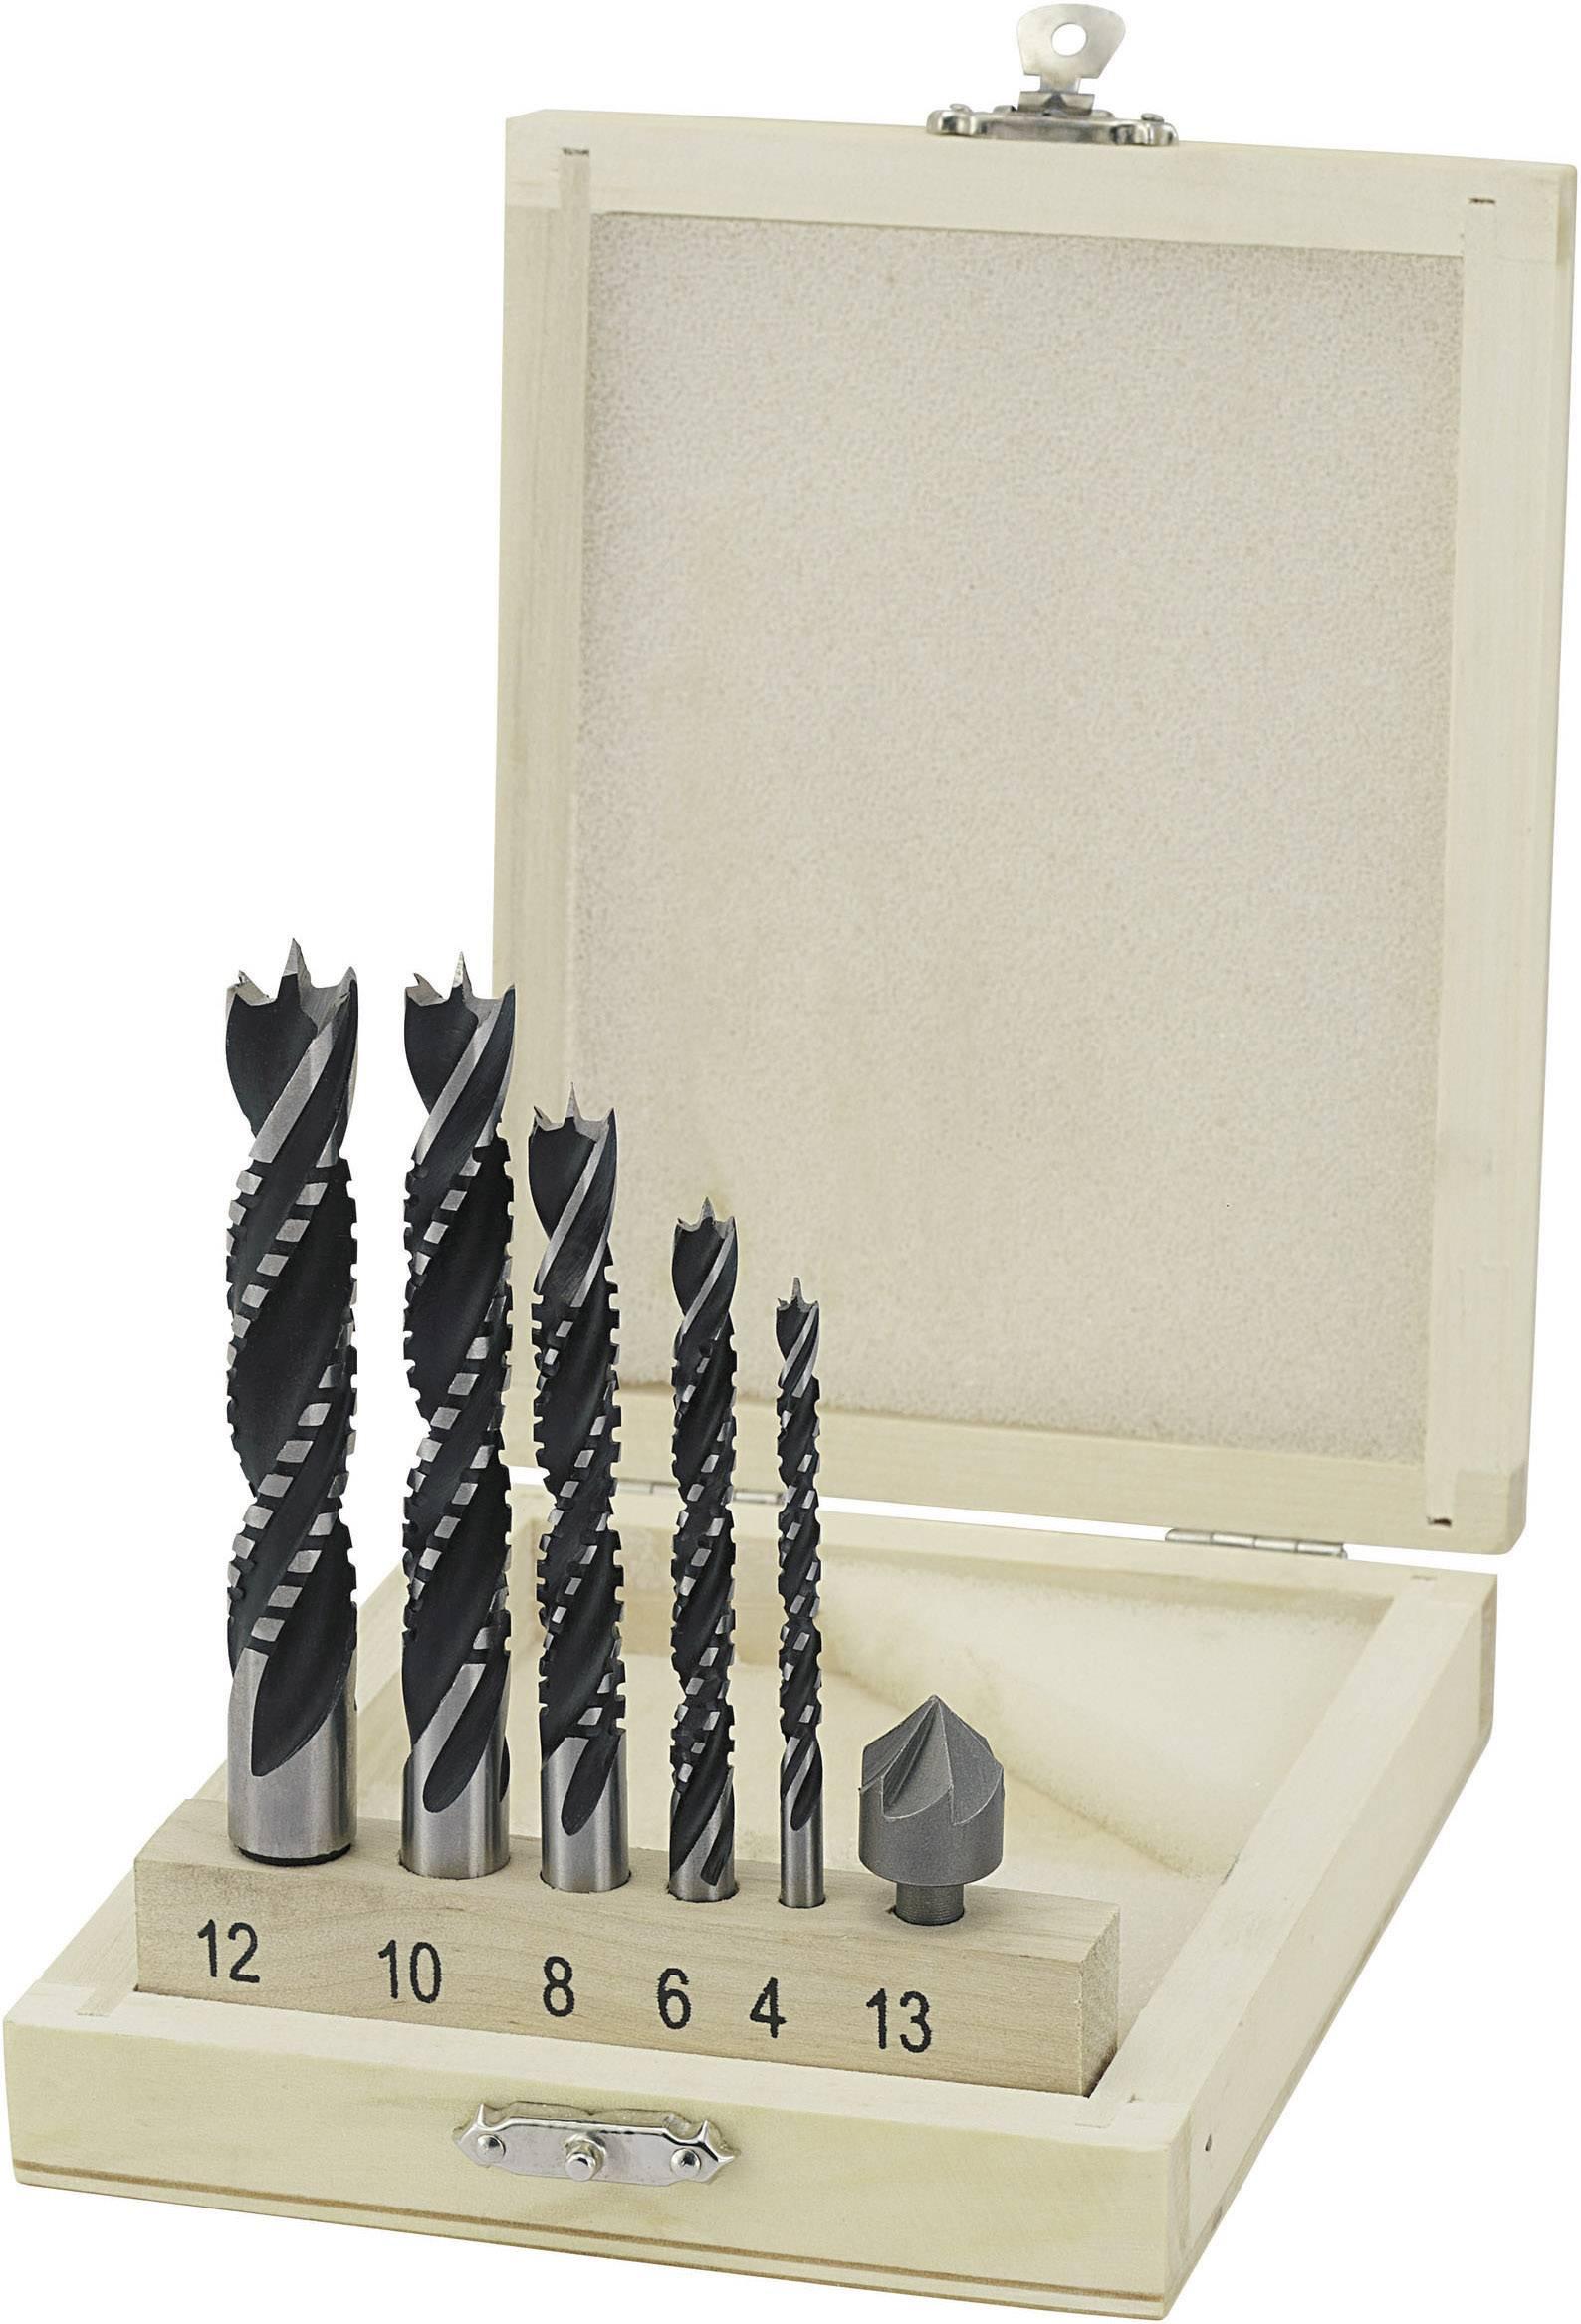 Špirálový vrták do dreva Basetech 813235, 4 mm, 6 mm, 8 mm, 10 mm, 12 mm, 1 sada